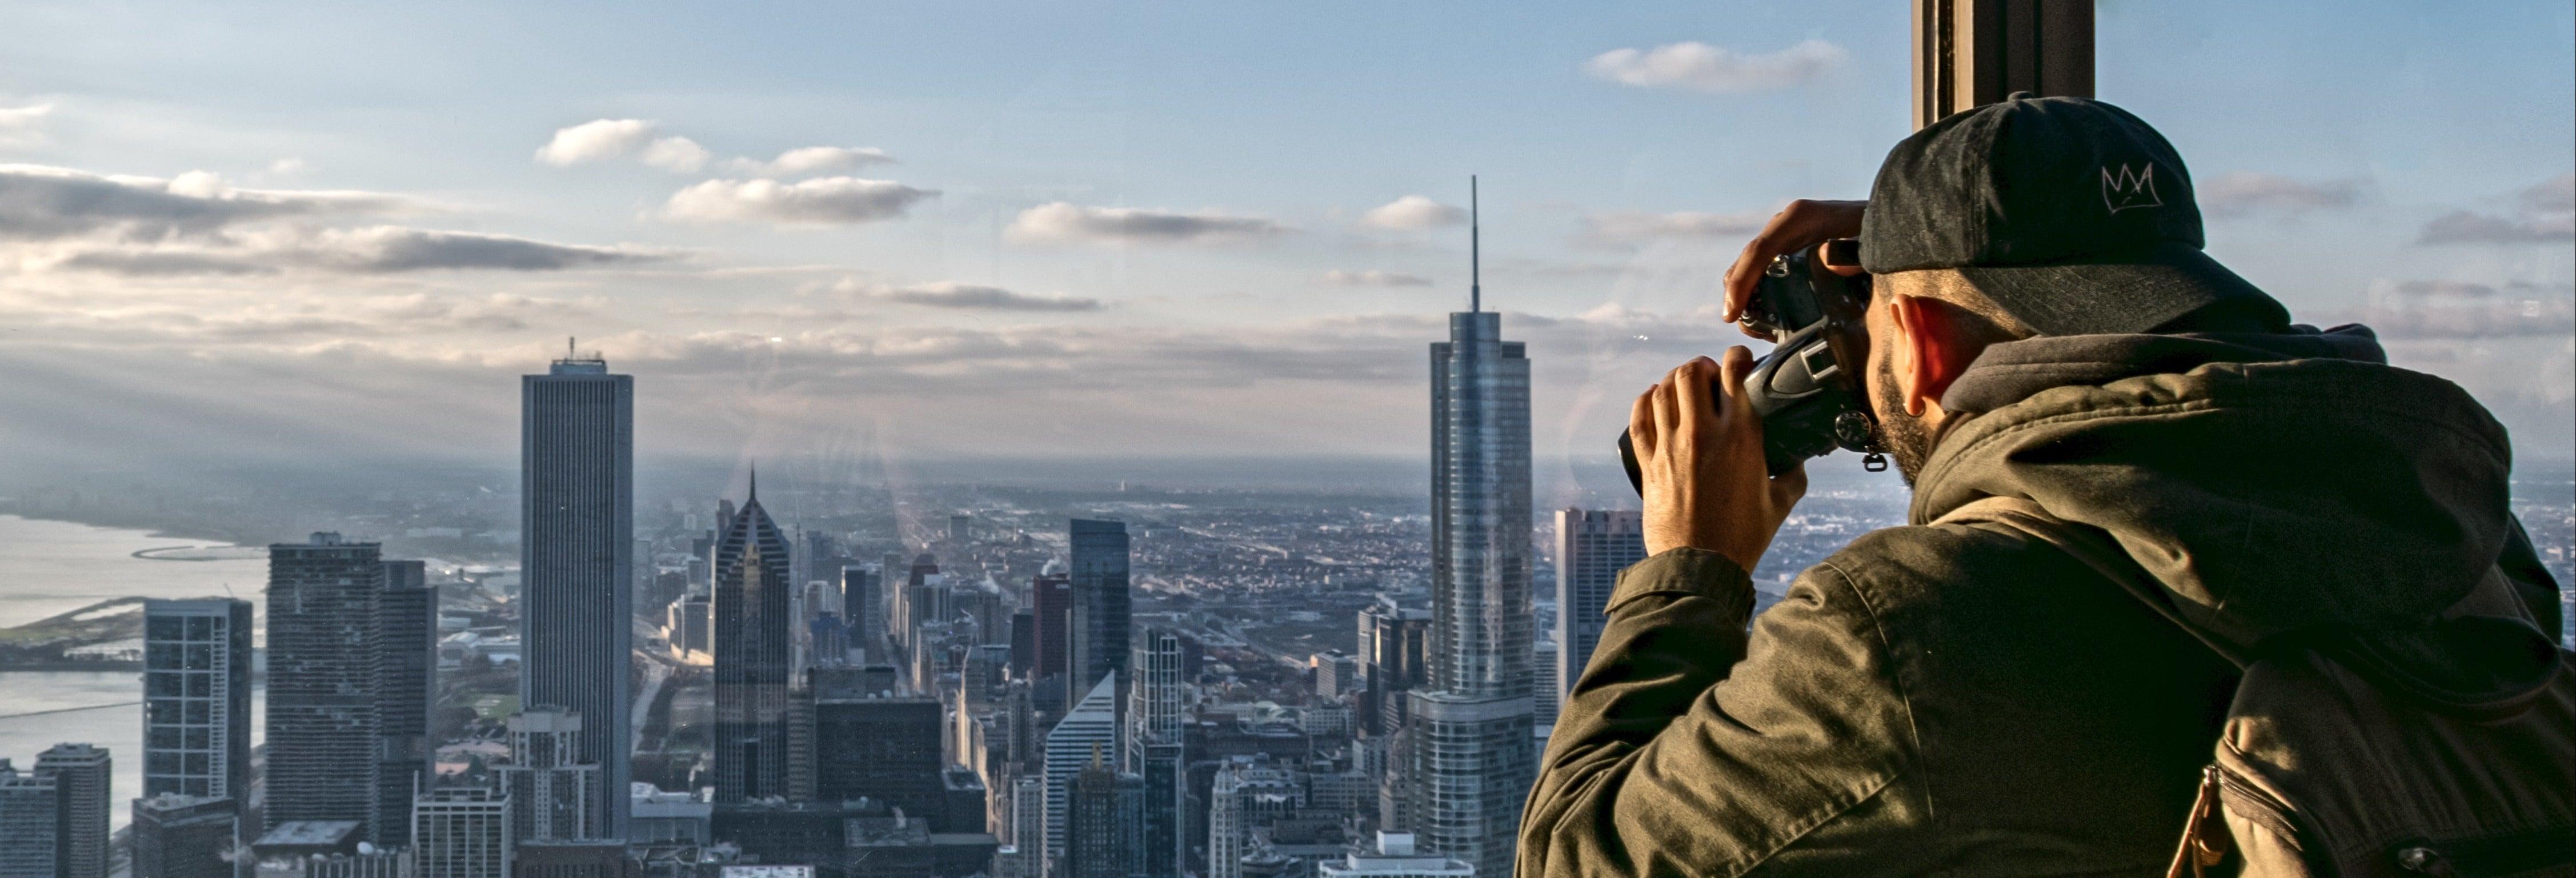 Entrada para 360 Chicago Observation Deck